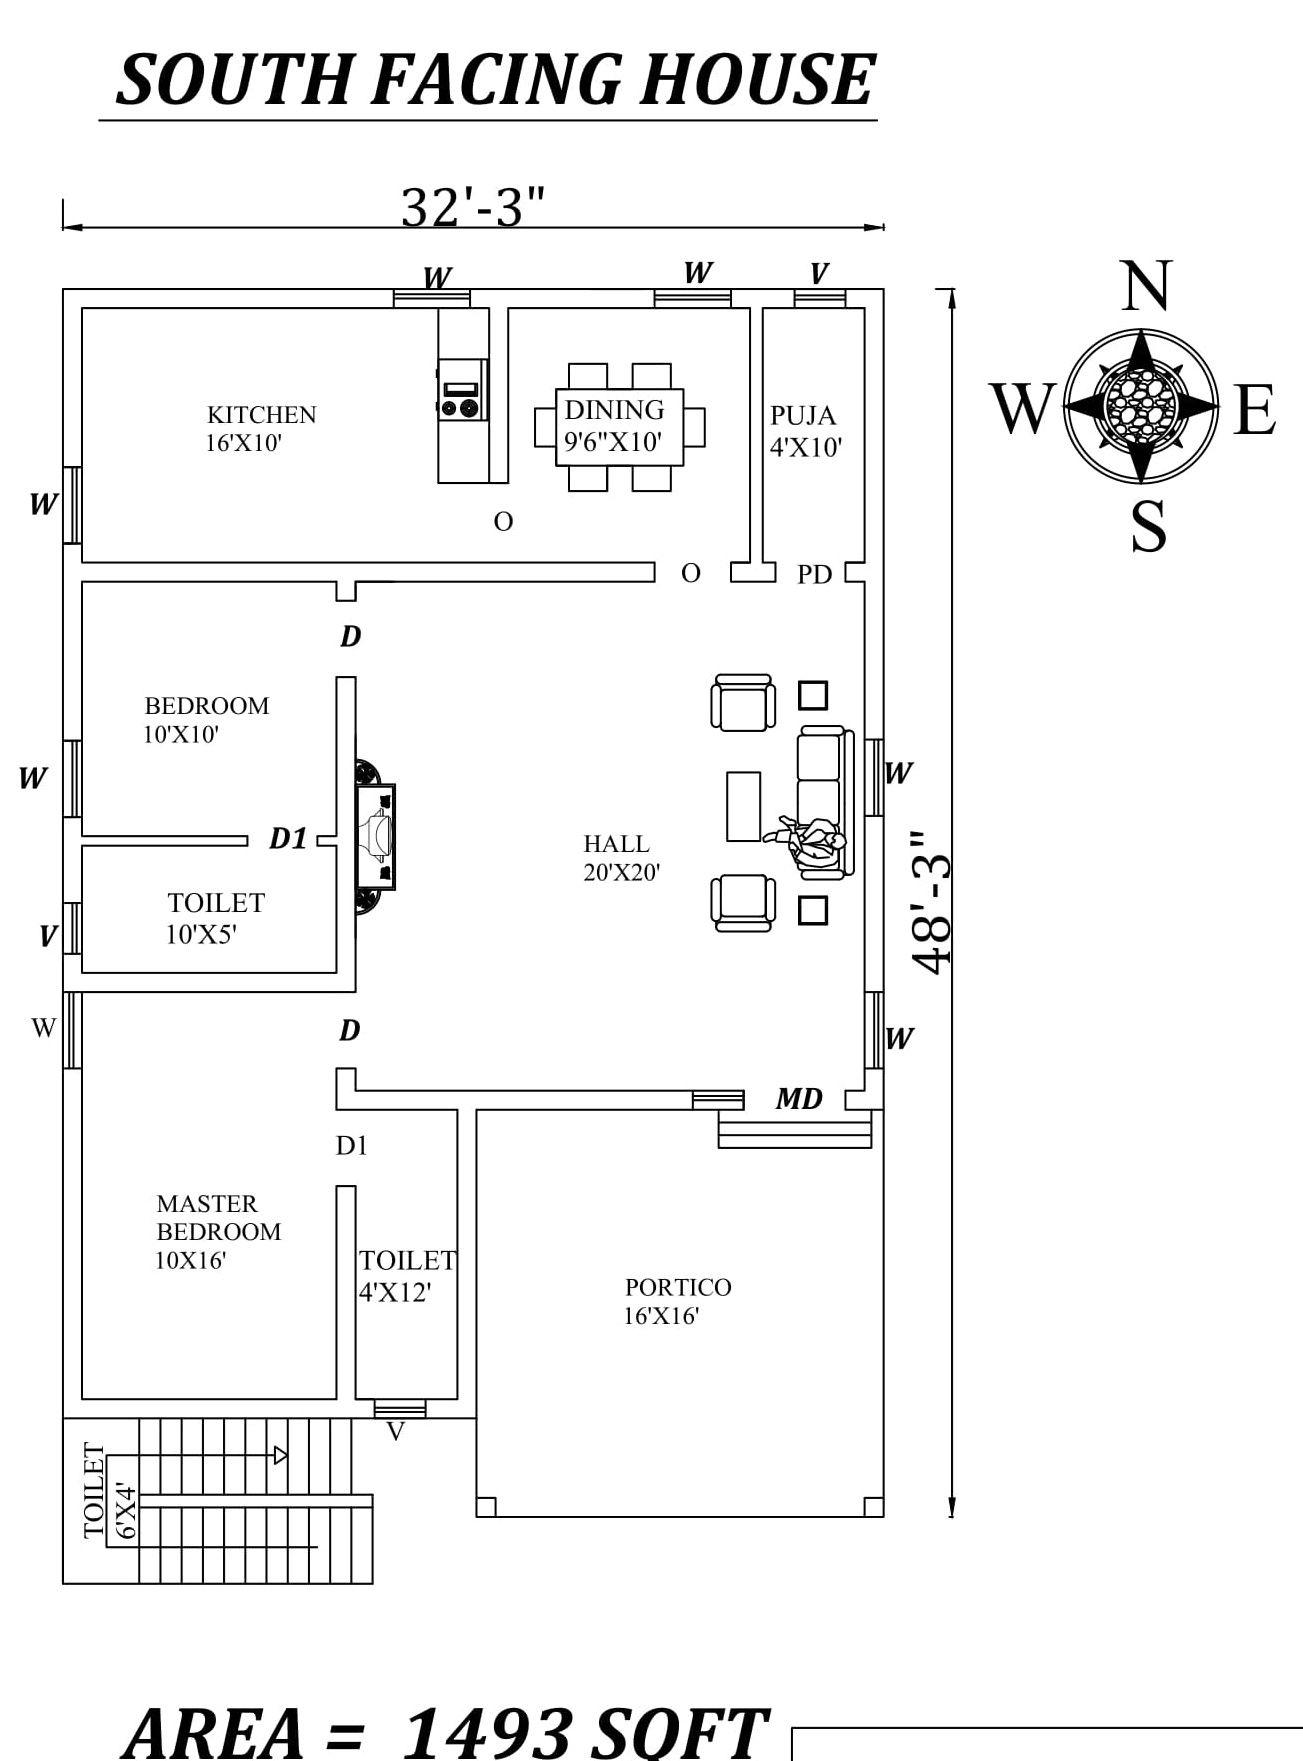 32 X48 Wonderful 2BHK South Facing House Plan As per vastu Shastra Autocad DWG File Details